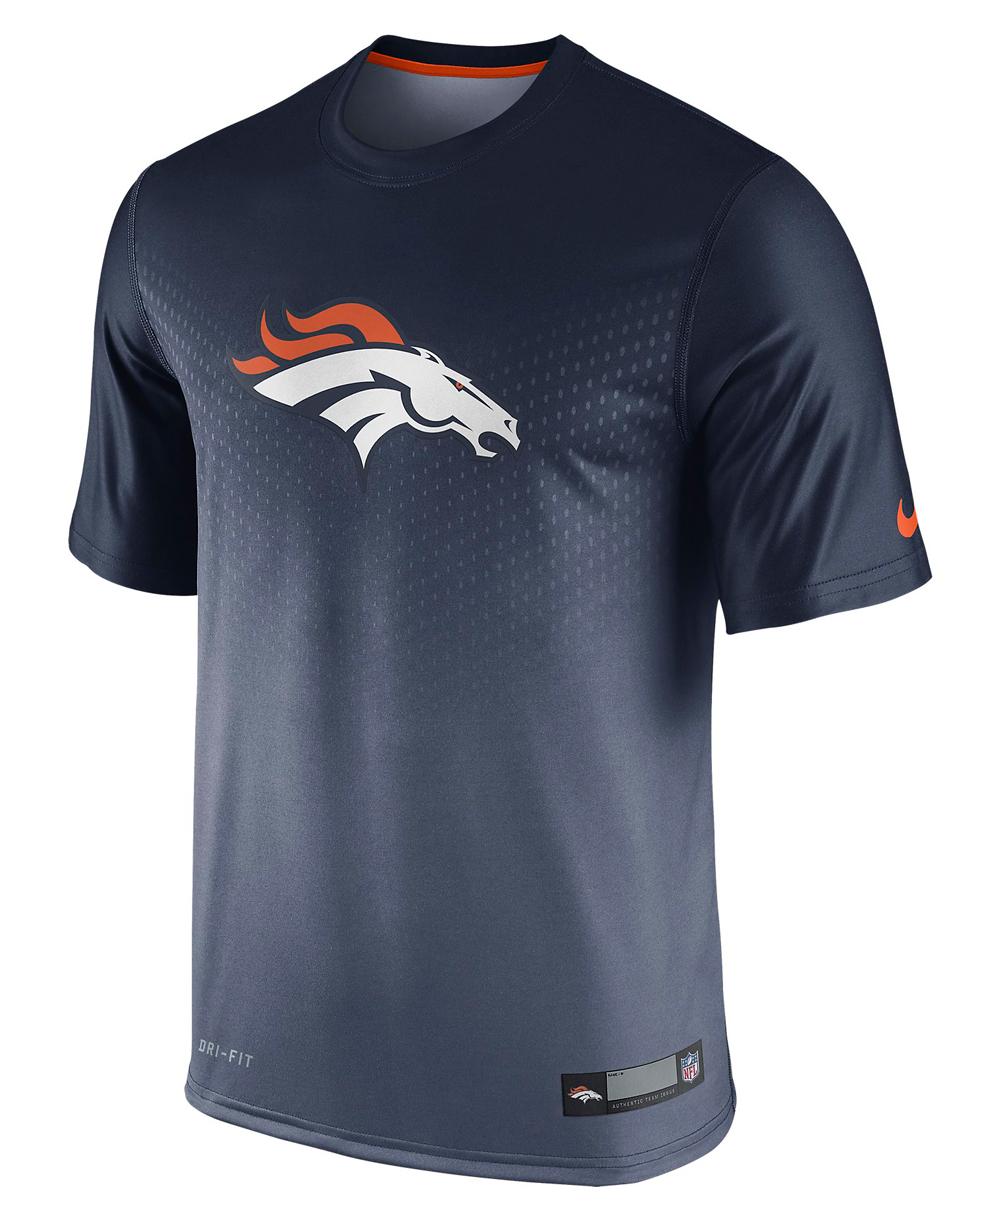 Legend Sideline T-Shirt Manica Corta Uomo NFL Denver Broncos